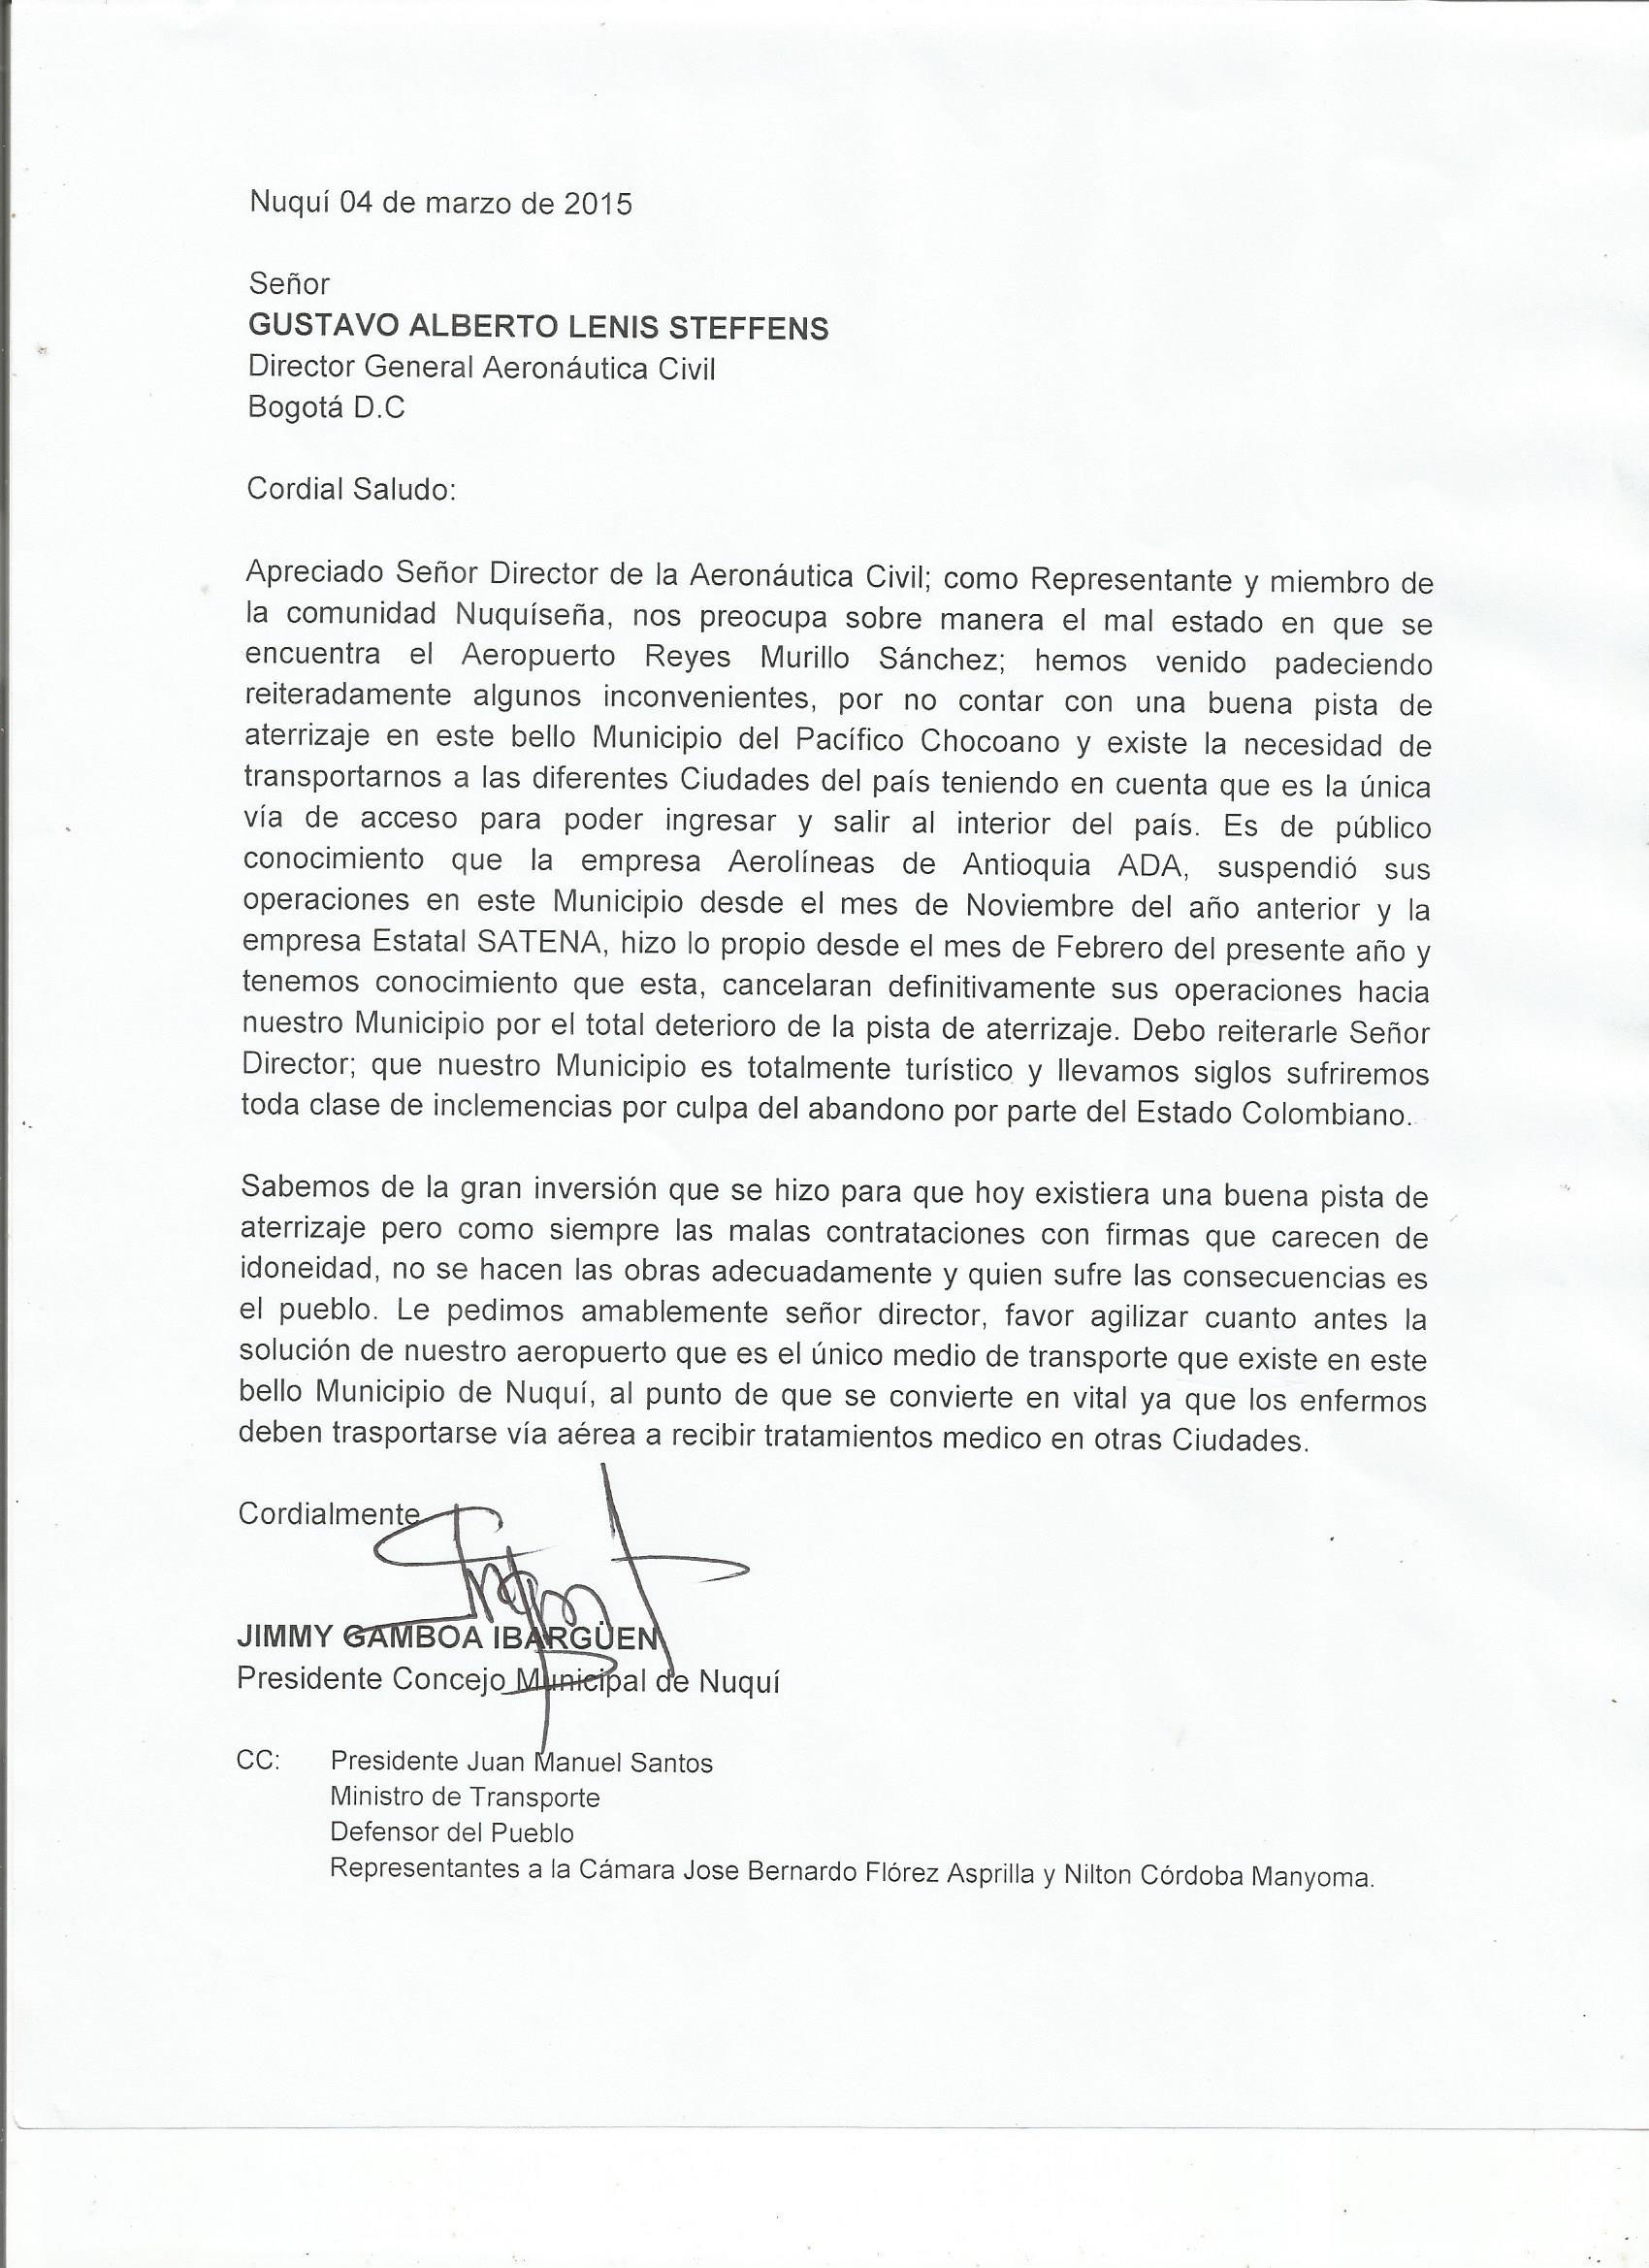 Carta de denuncia dirigida al director de la Aeronáutica Civil